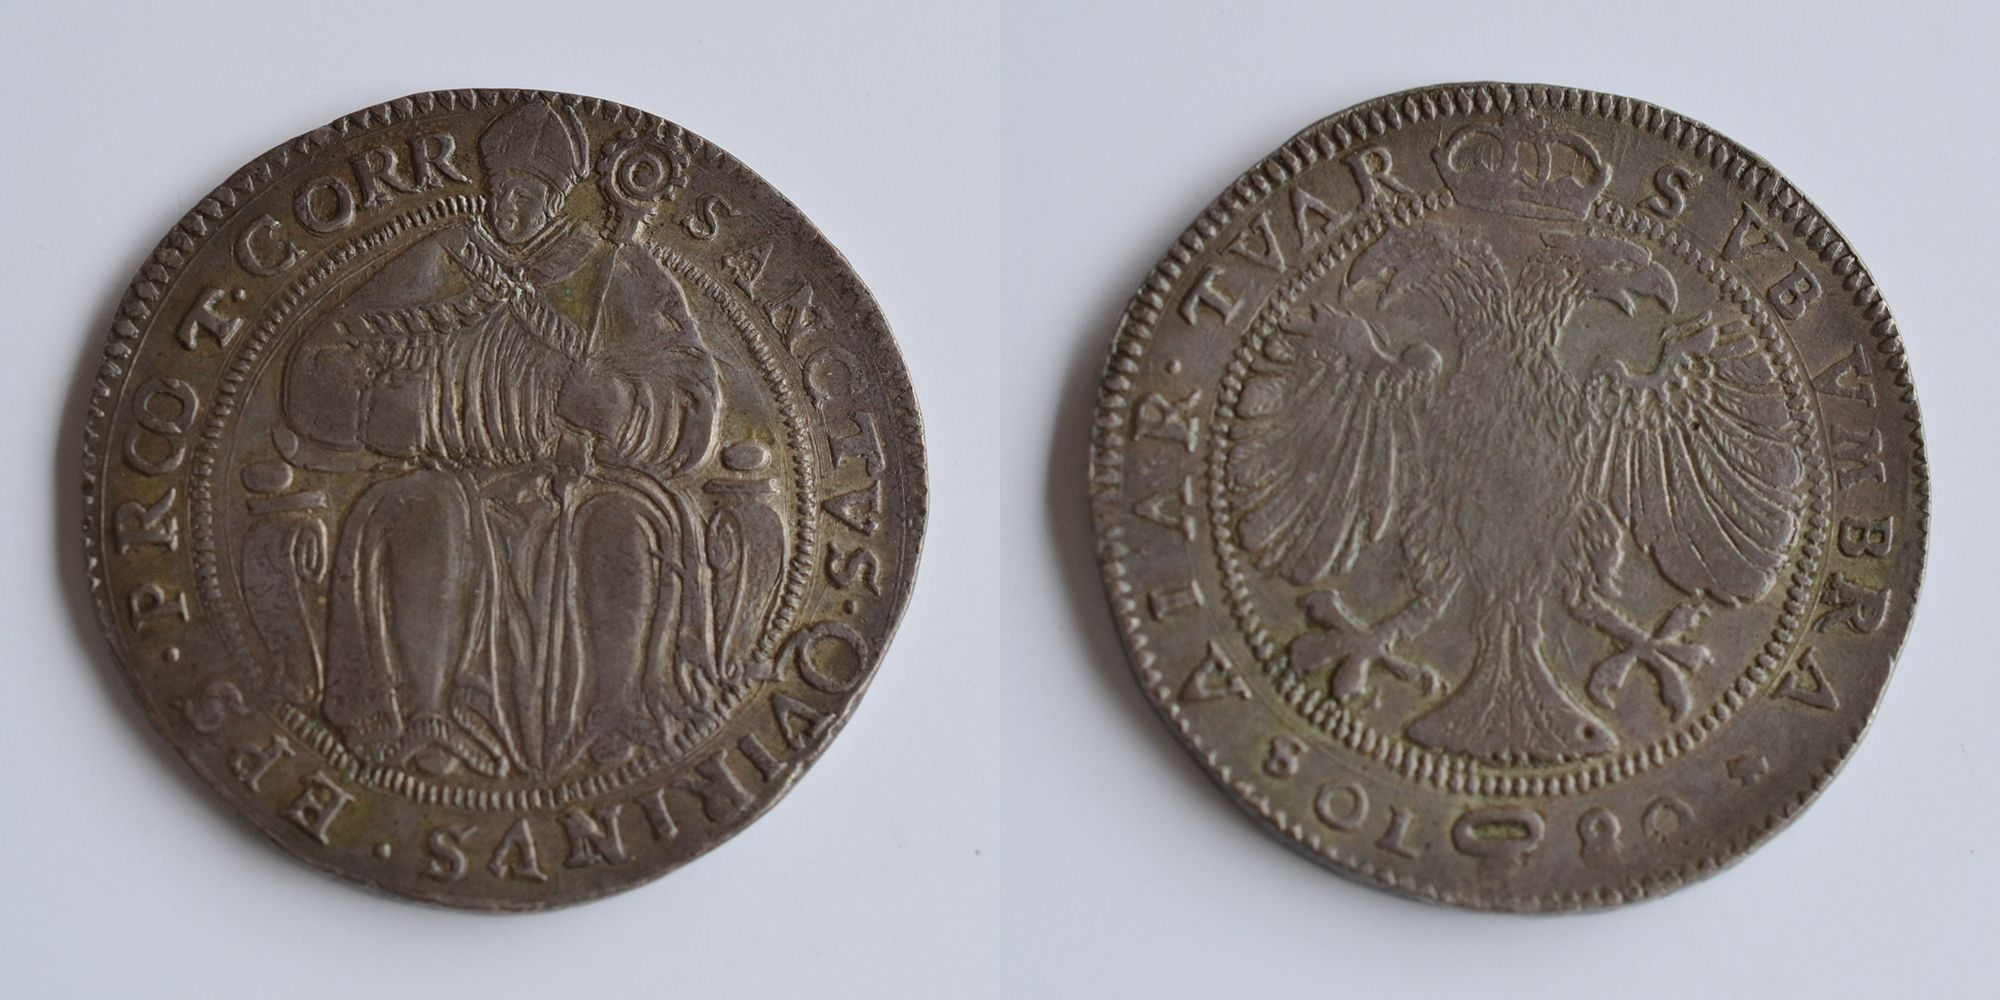 Taler aus Correggio der Familie dÀustria, Roll 3 (Bild: Privatbesitz)